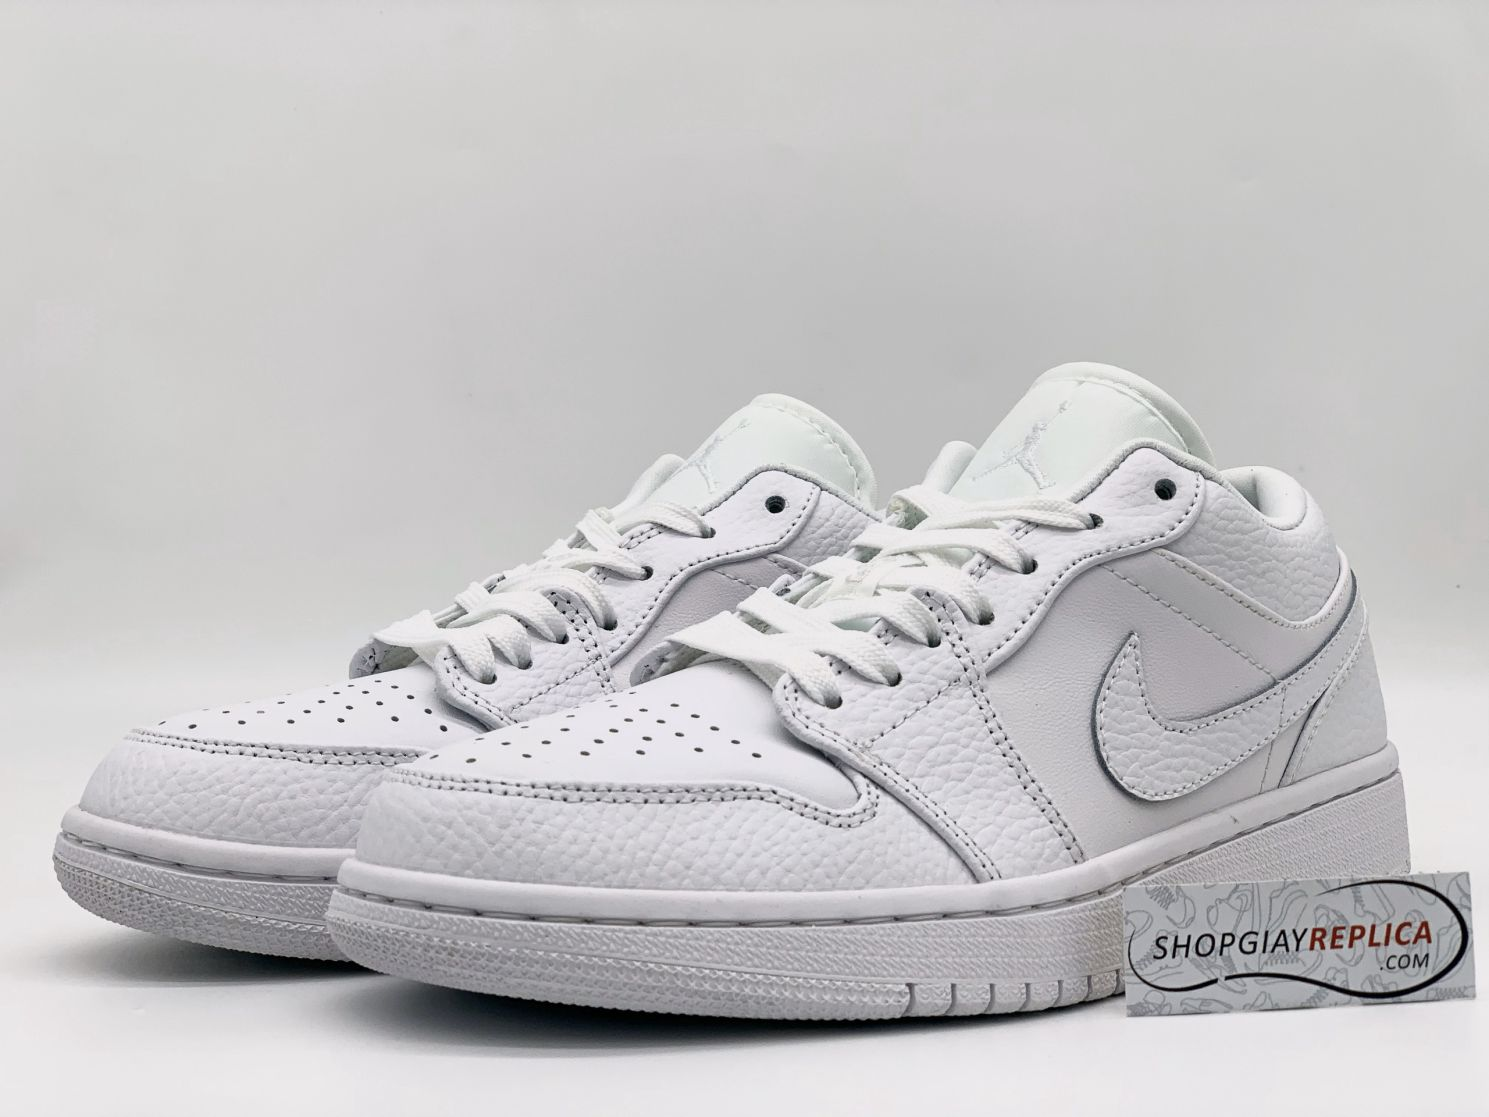 Nike Air Jordan 1 Low White